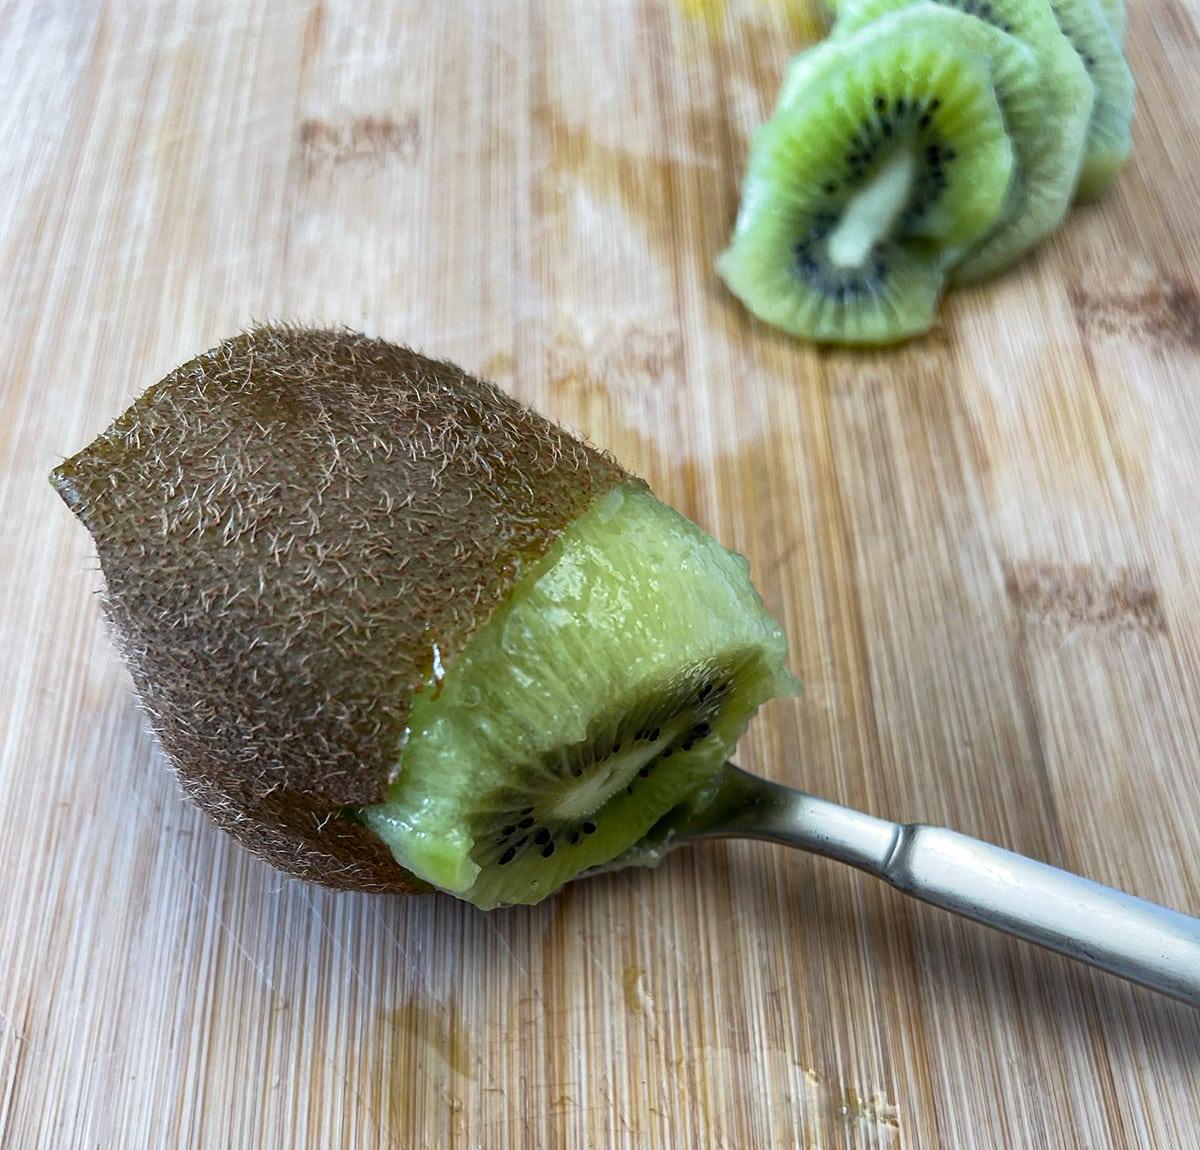 kiwi on wooden cutting board, spooning to cut